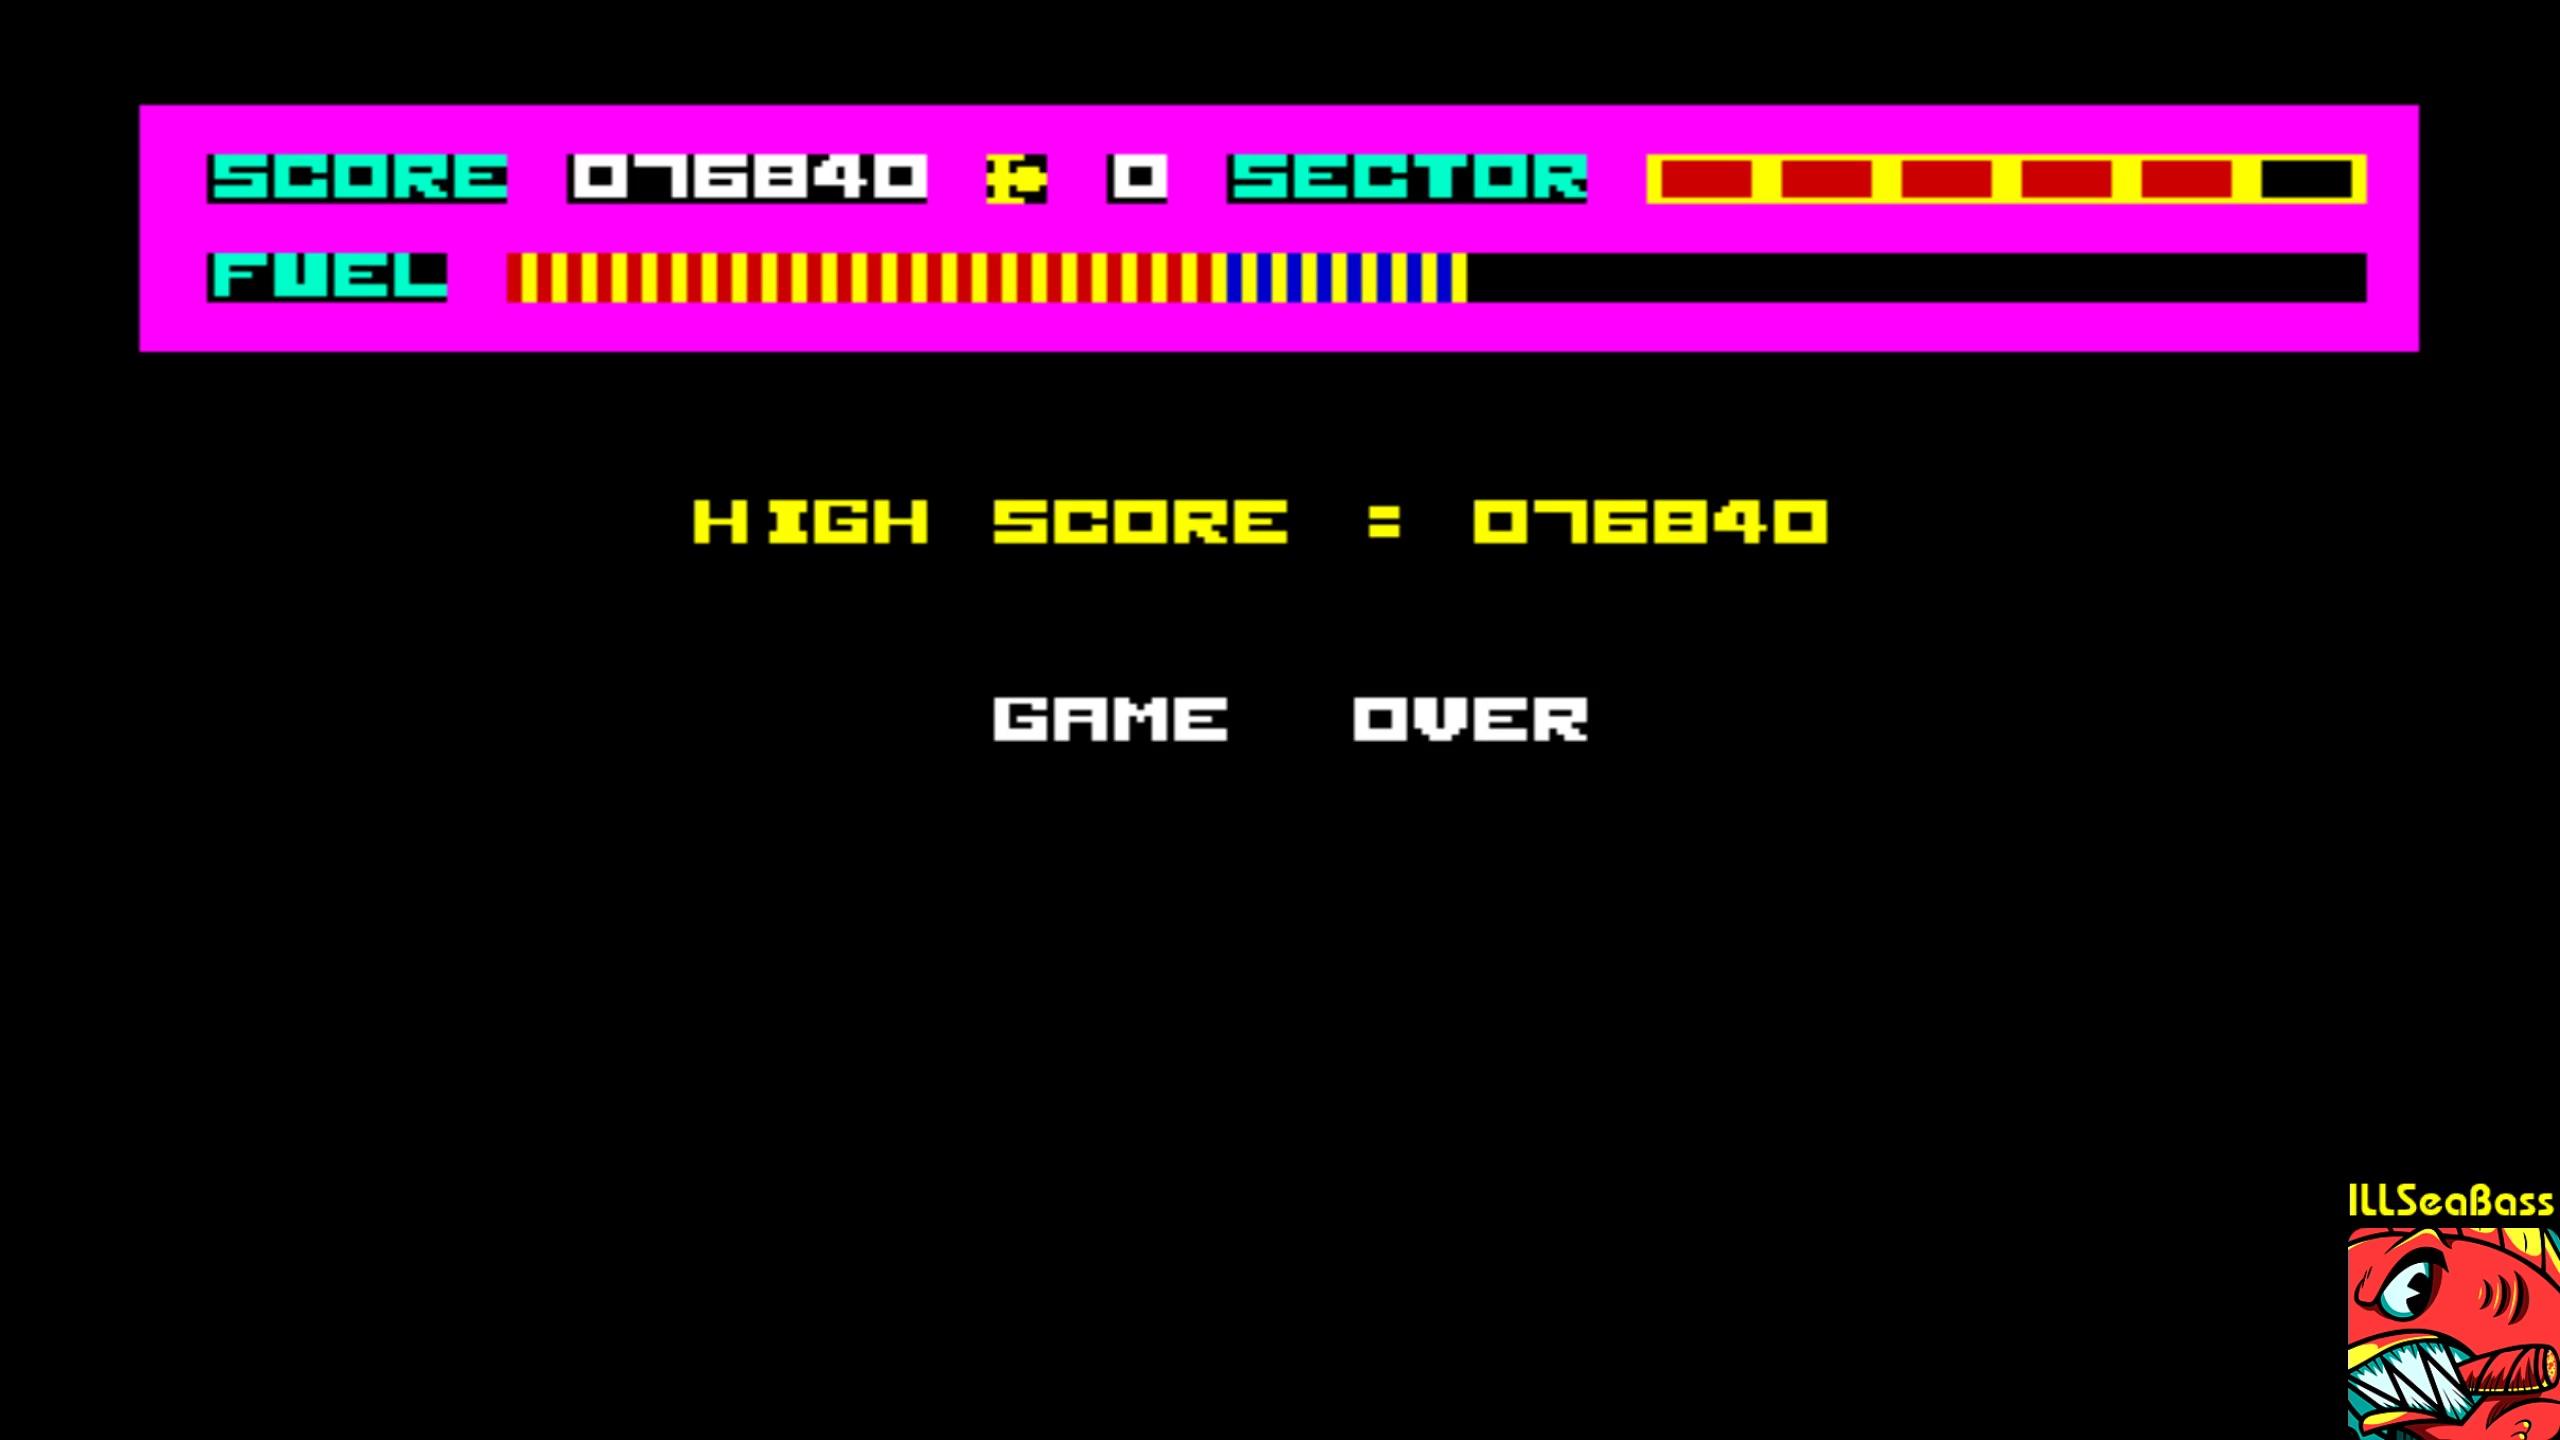 ILLSeaBass: Skramble [Anirog Software] (Commodore 64 Emulated) 76,840 points on 2018-02-13 09:07:41